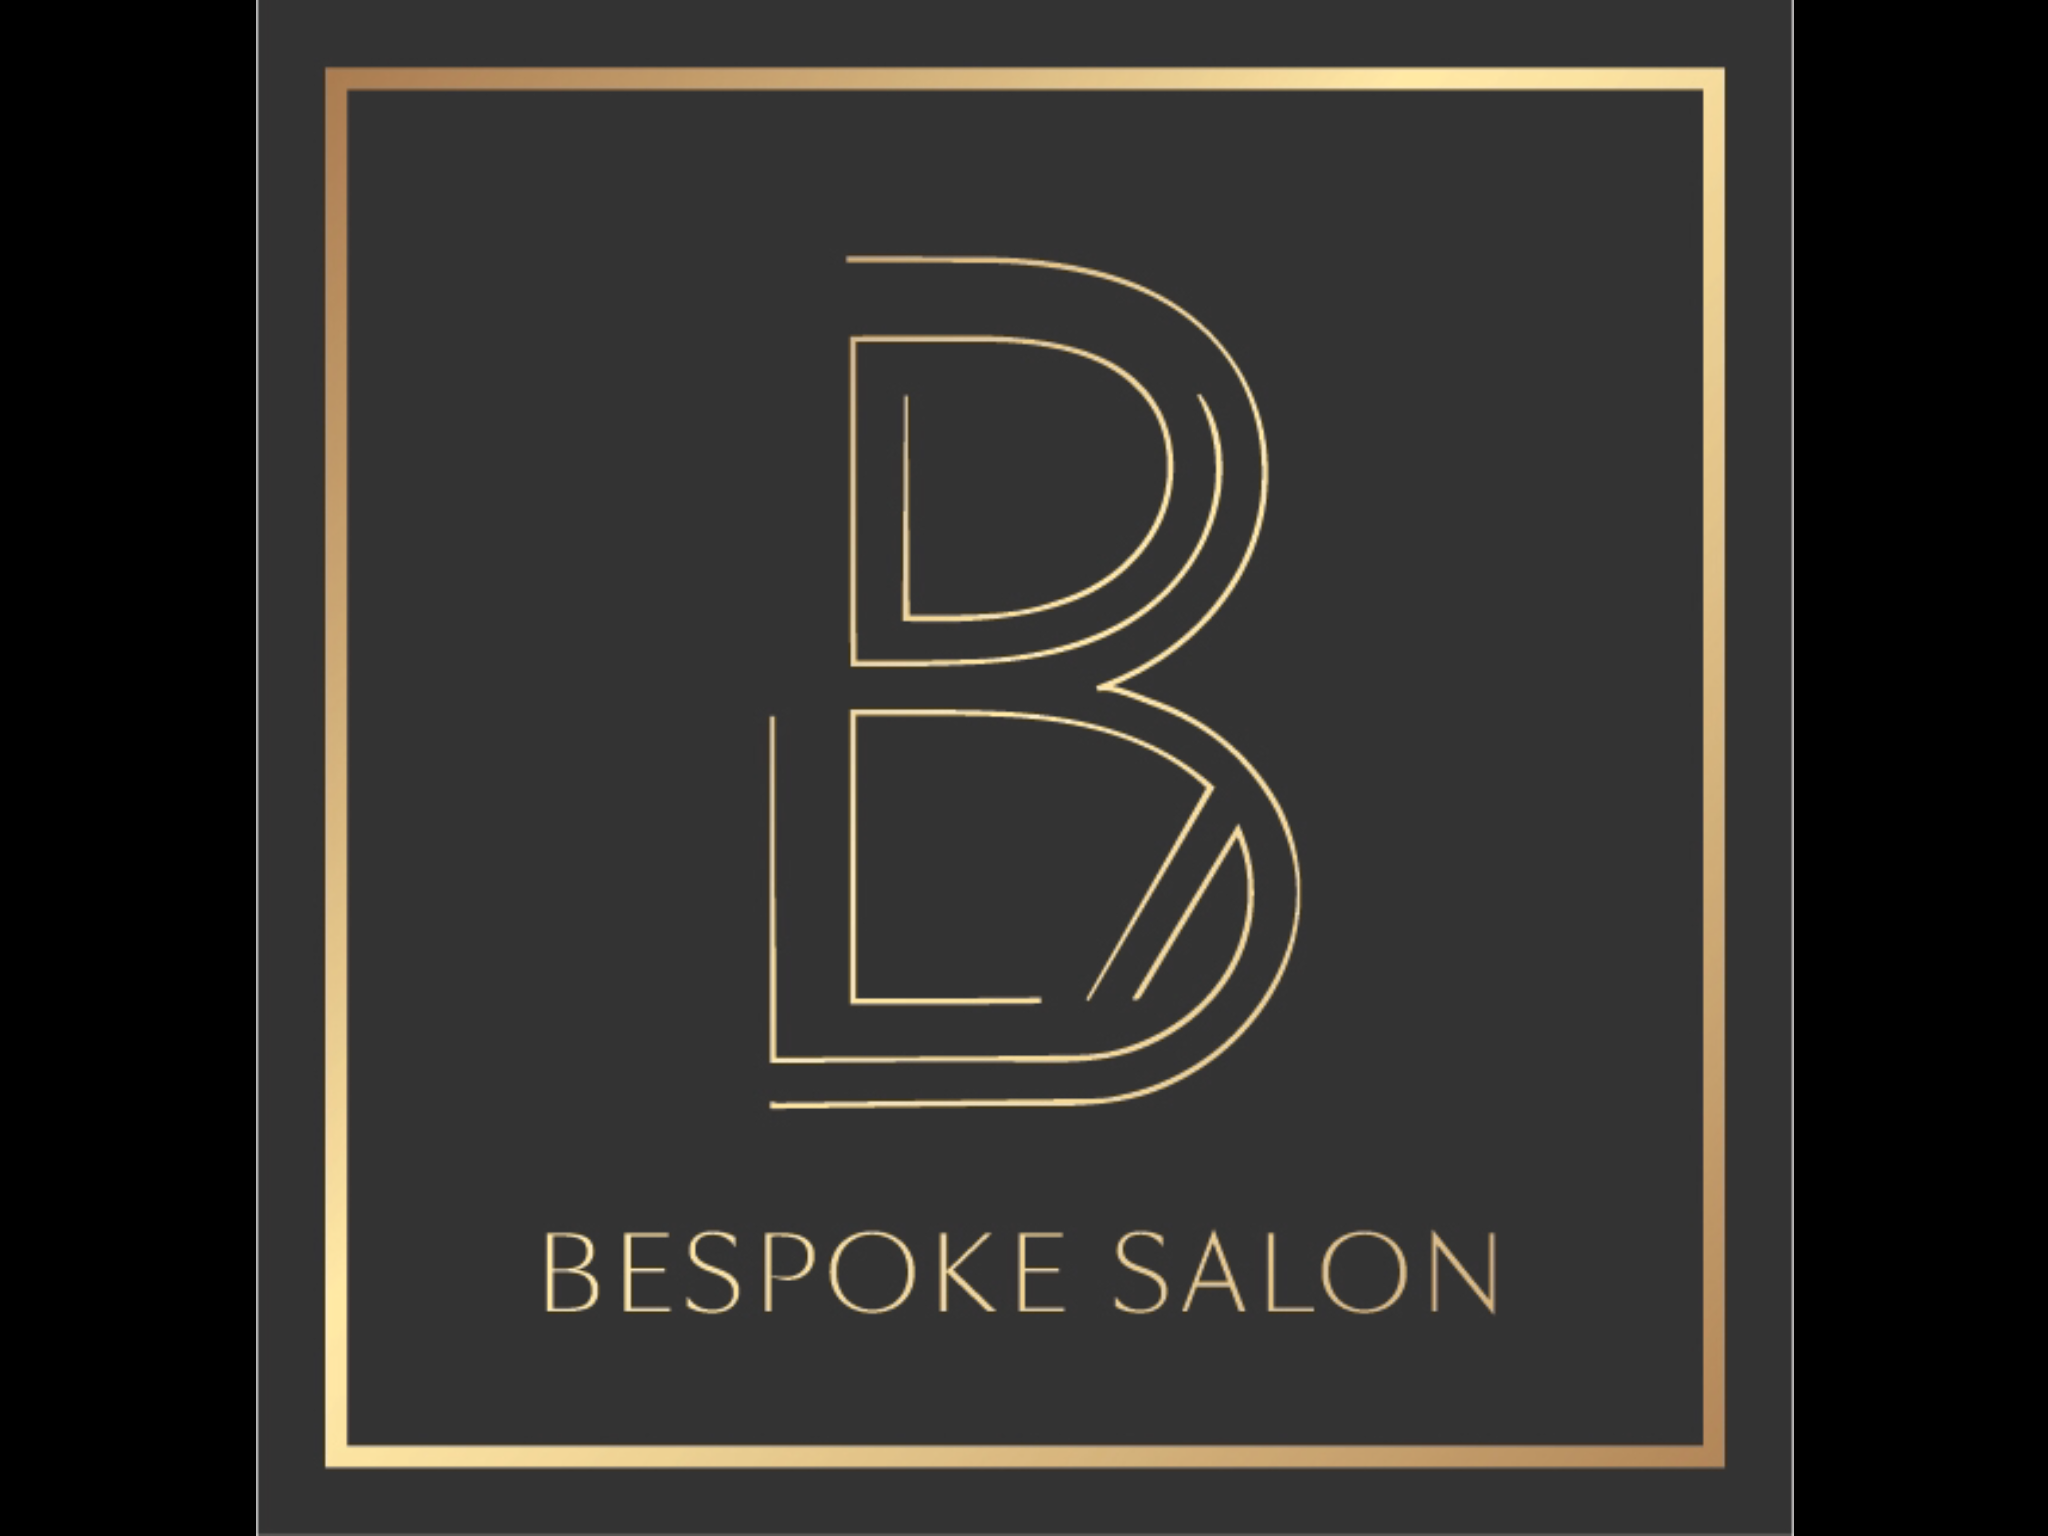 BeSpoke Salon